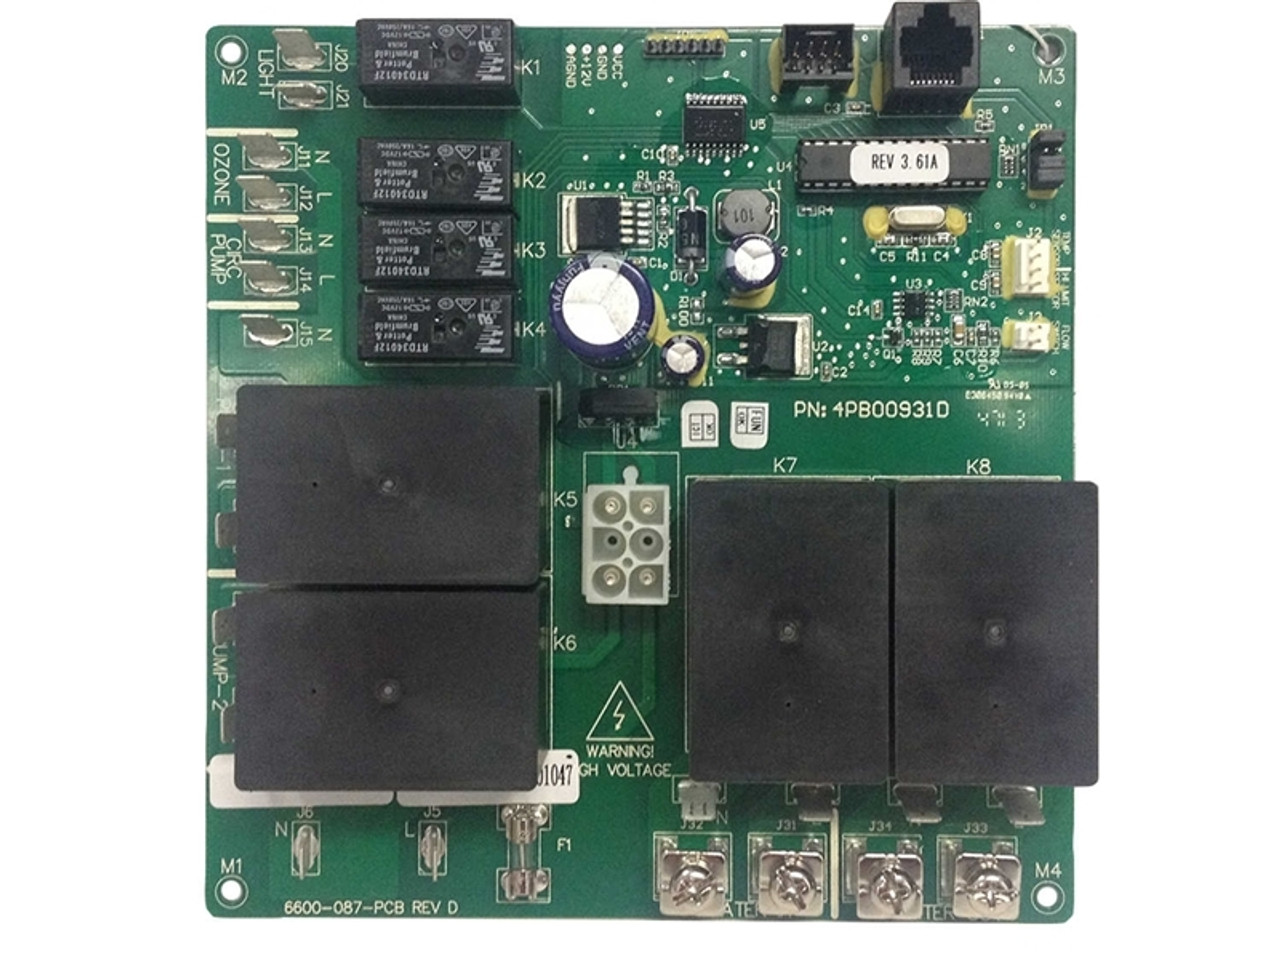 6600-726 Circuit Board Sundance Spas/Jacuzzi/Sweeer Circuit Board on